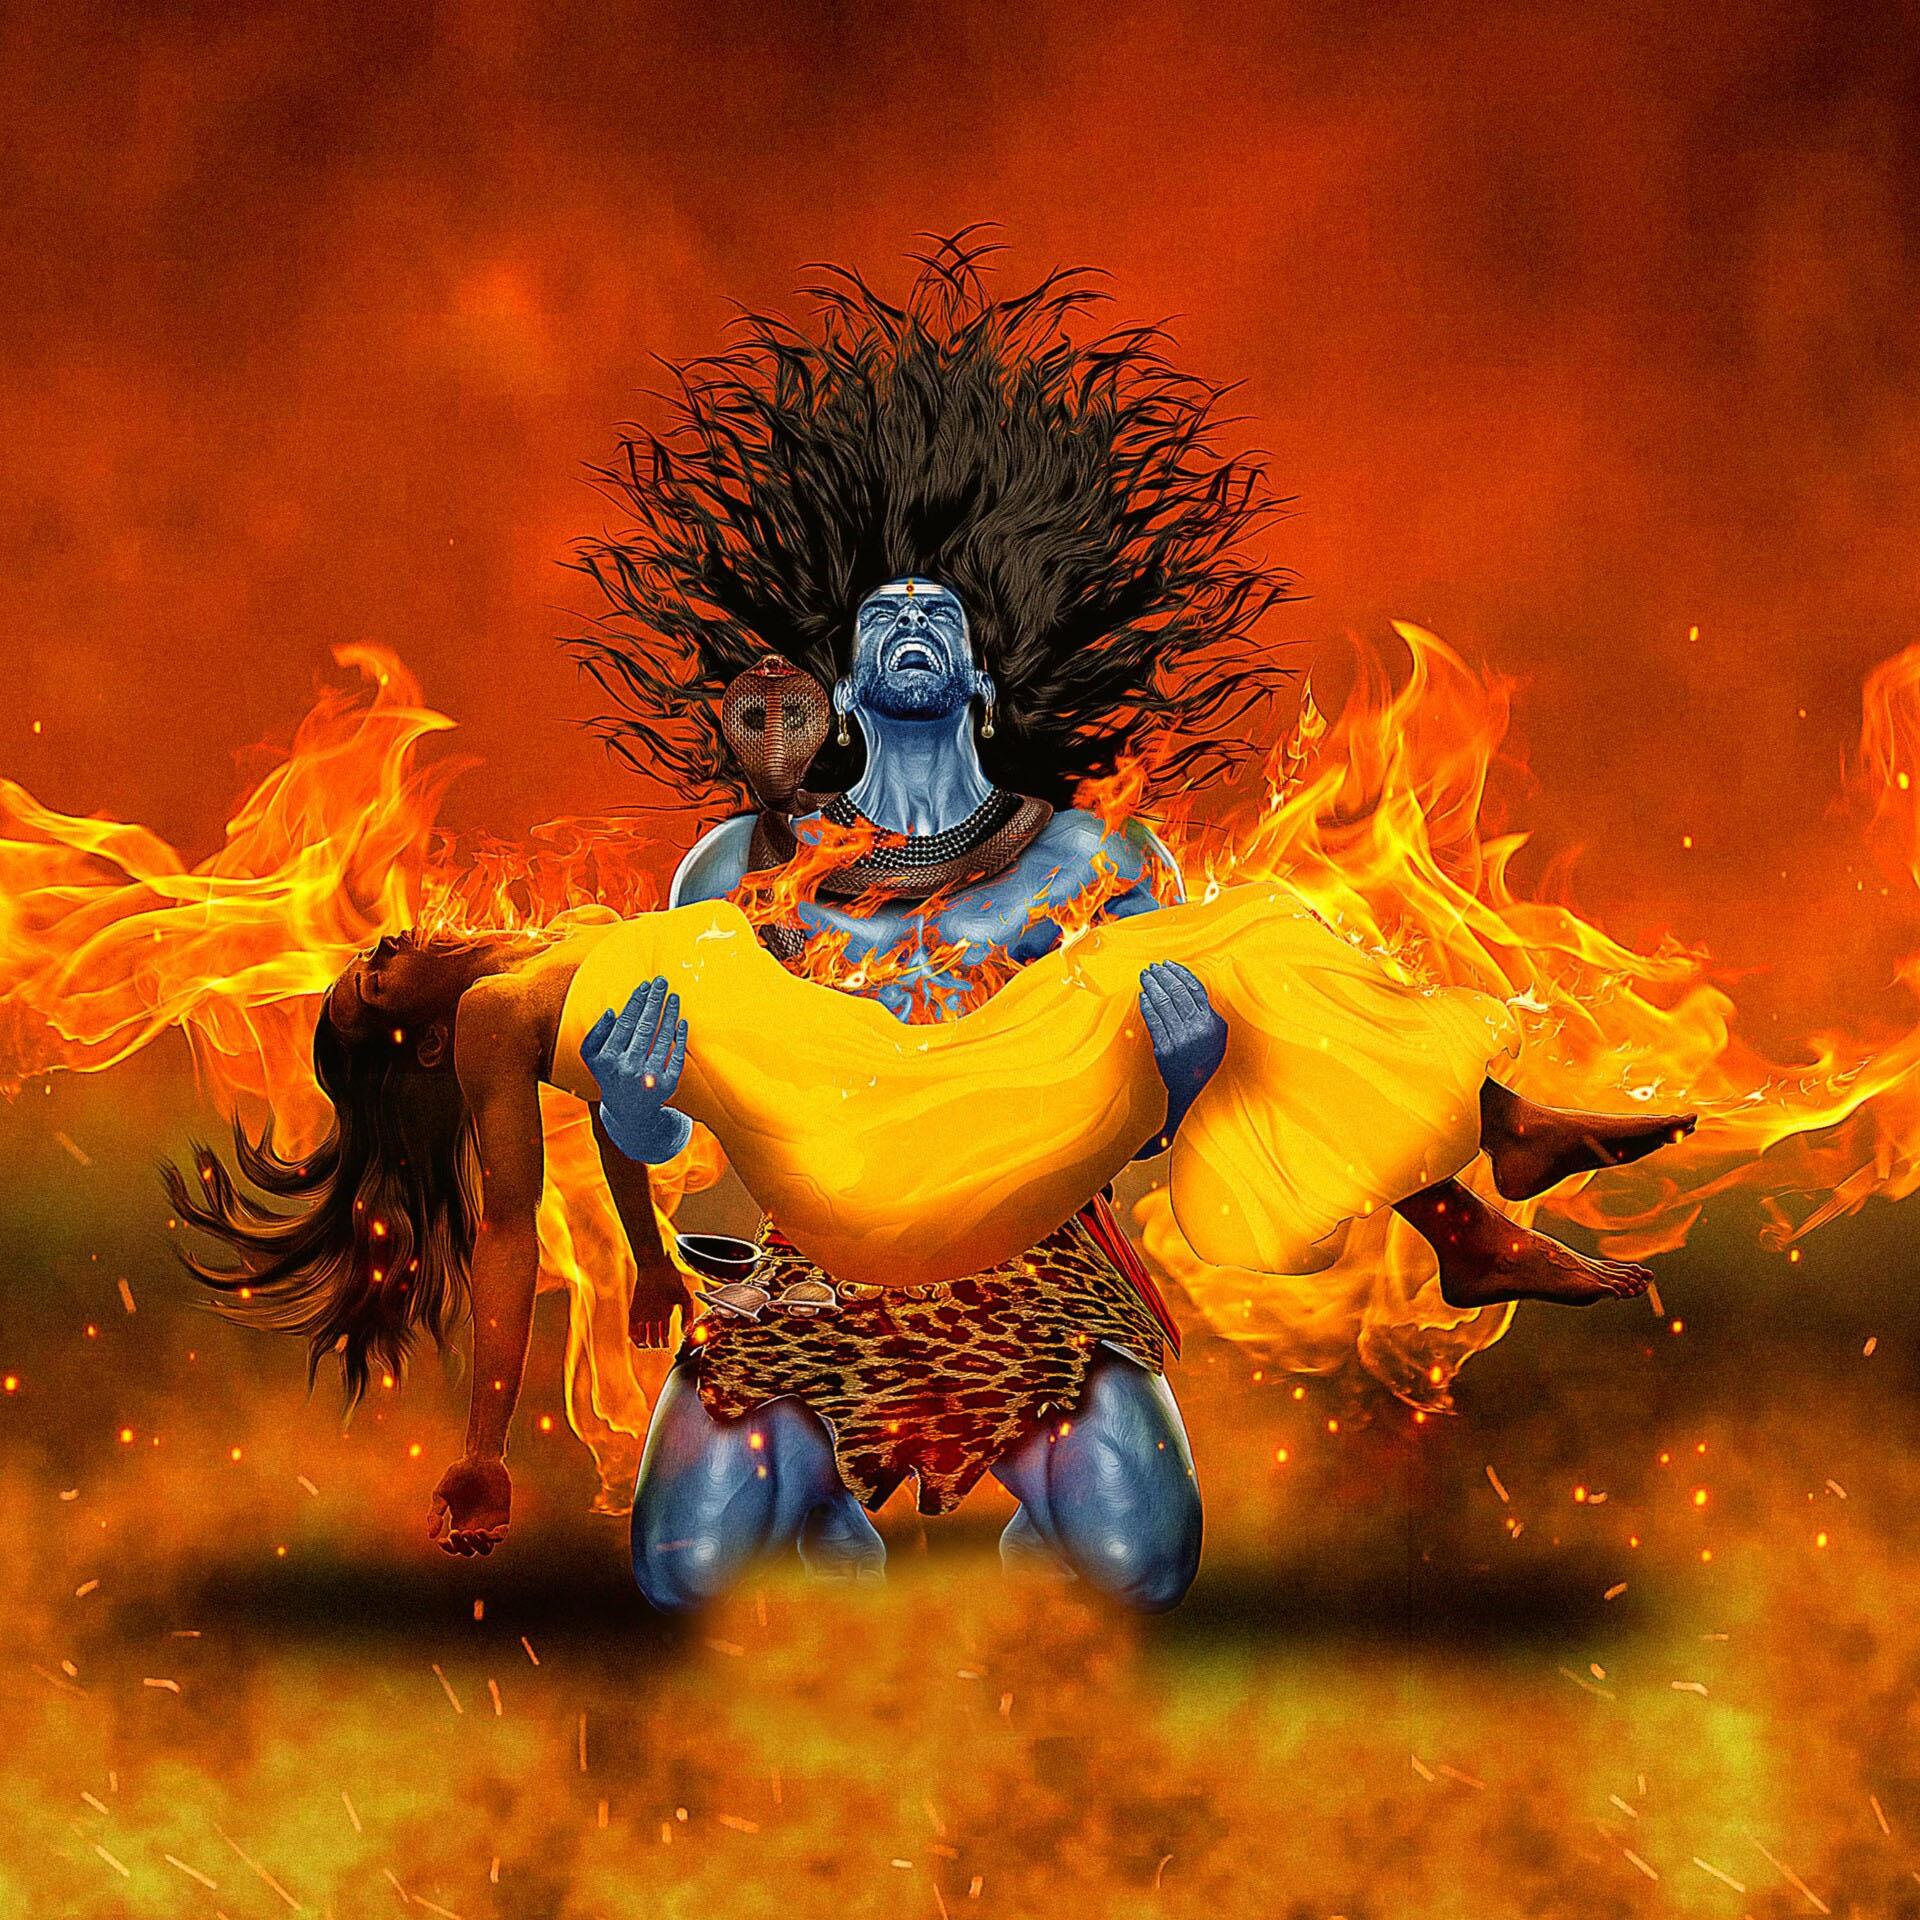 , Diwali 2020, Diwali, Diwali Date, Devi Lakshmi, Goddess Lakshmi, lakshmi devi diwali, goddess lakshmi diwali, lakshmi devi pooja on diwali, kali puja on diwali, mahakali, Devi kali, Dharmik katha, Religious Story in hindi, Punjab kesari, Dharm